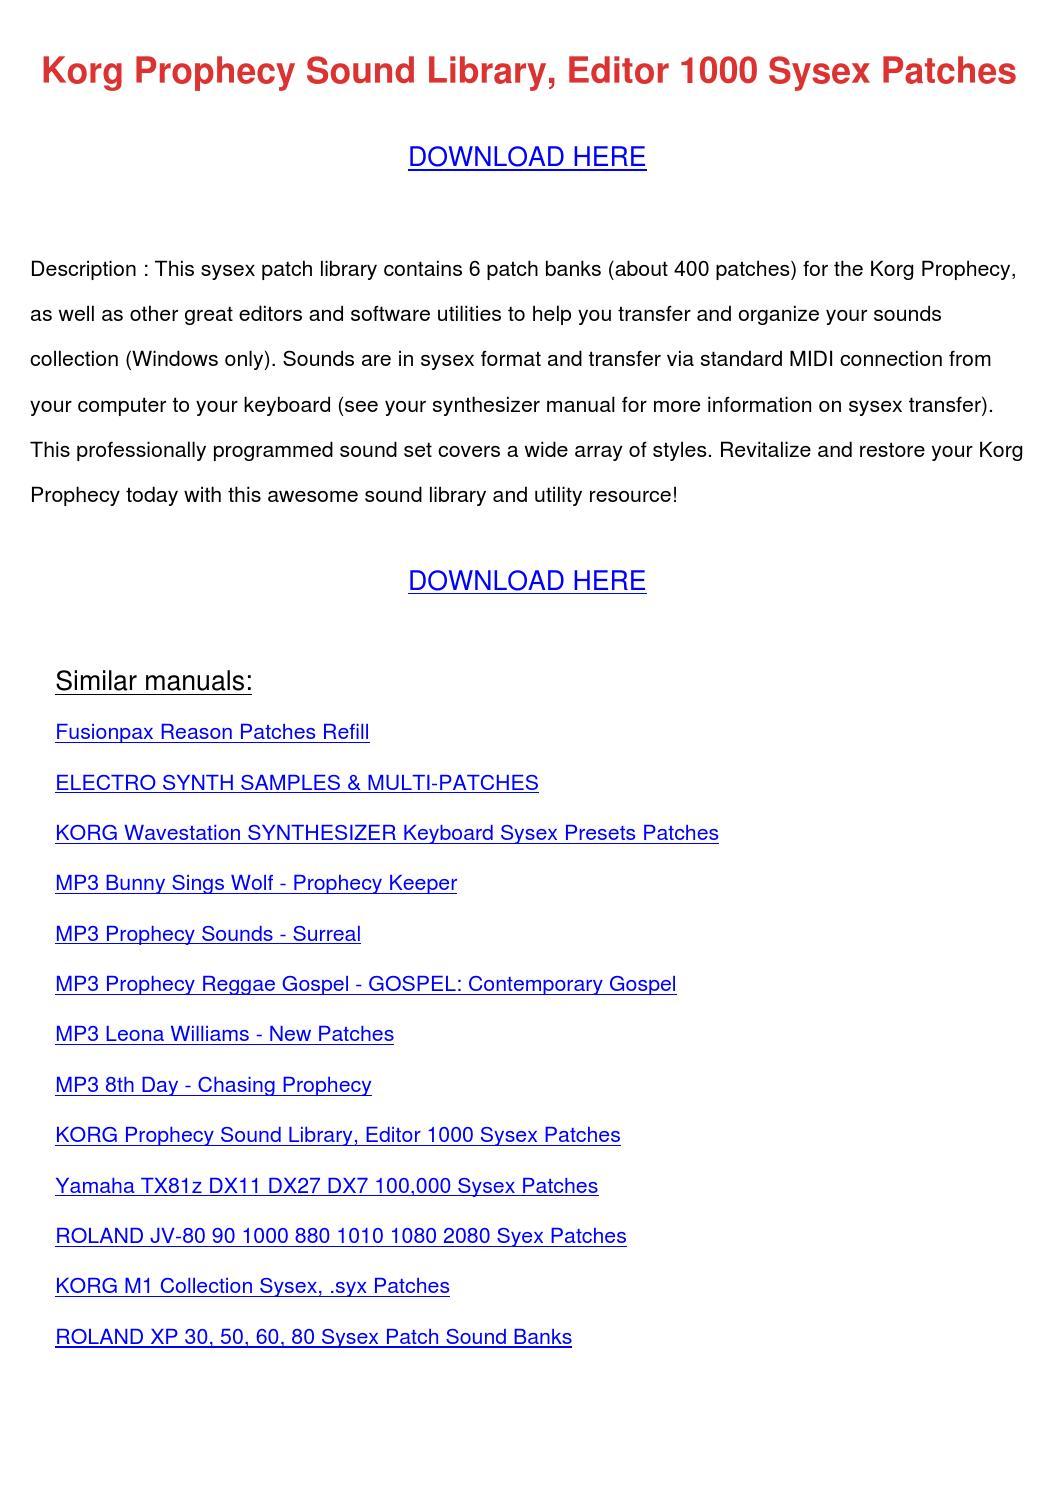 Korg Prophecy Sound Library Editor 1000 Sysex by DoyleCrist - issuu